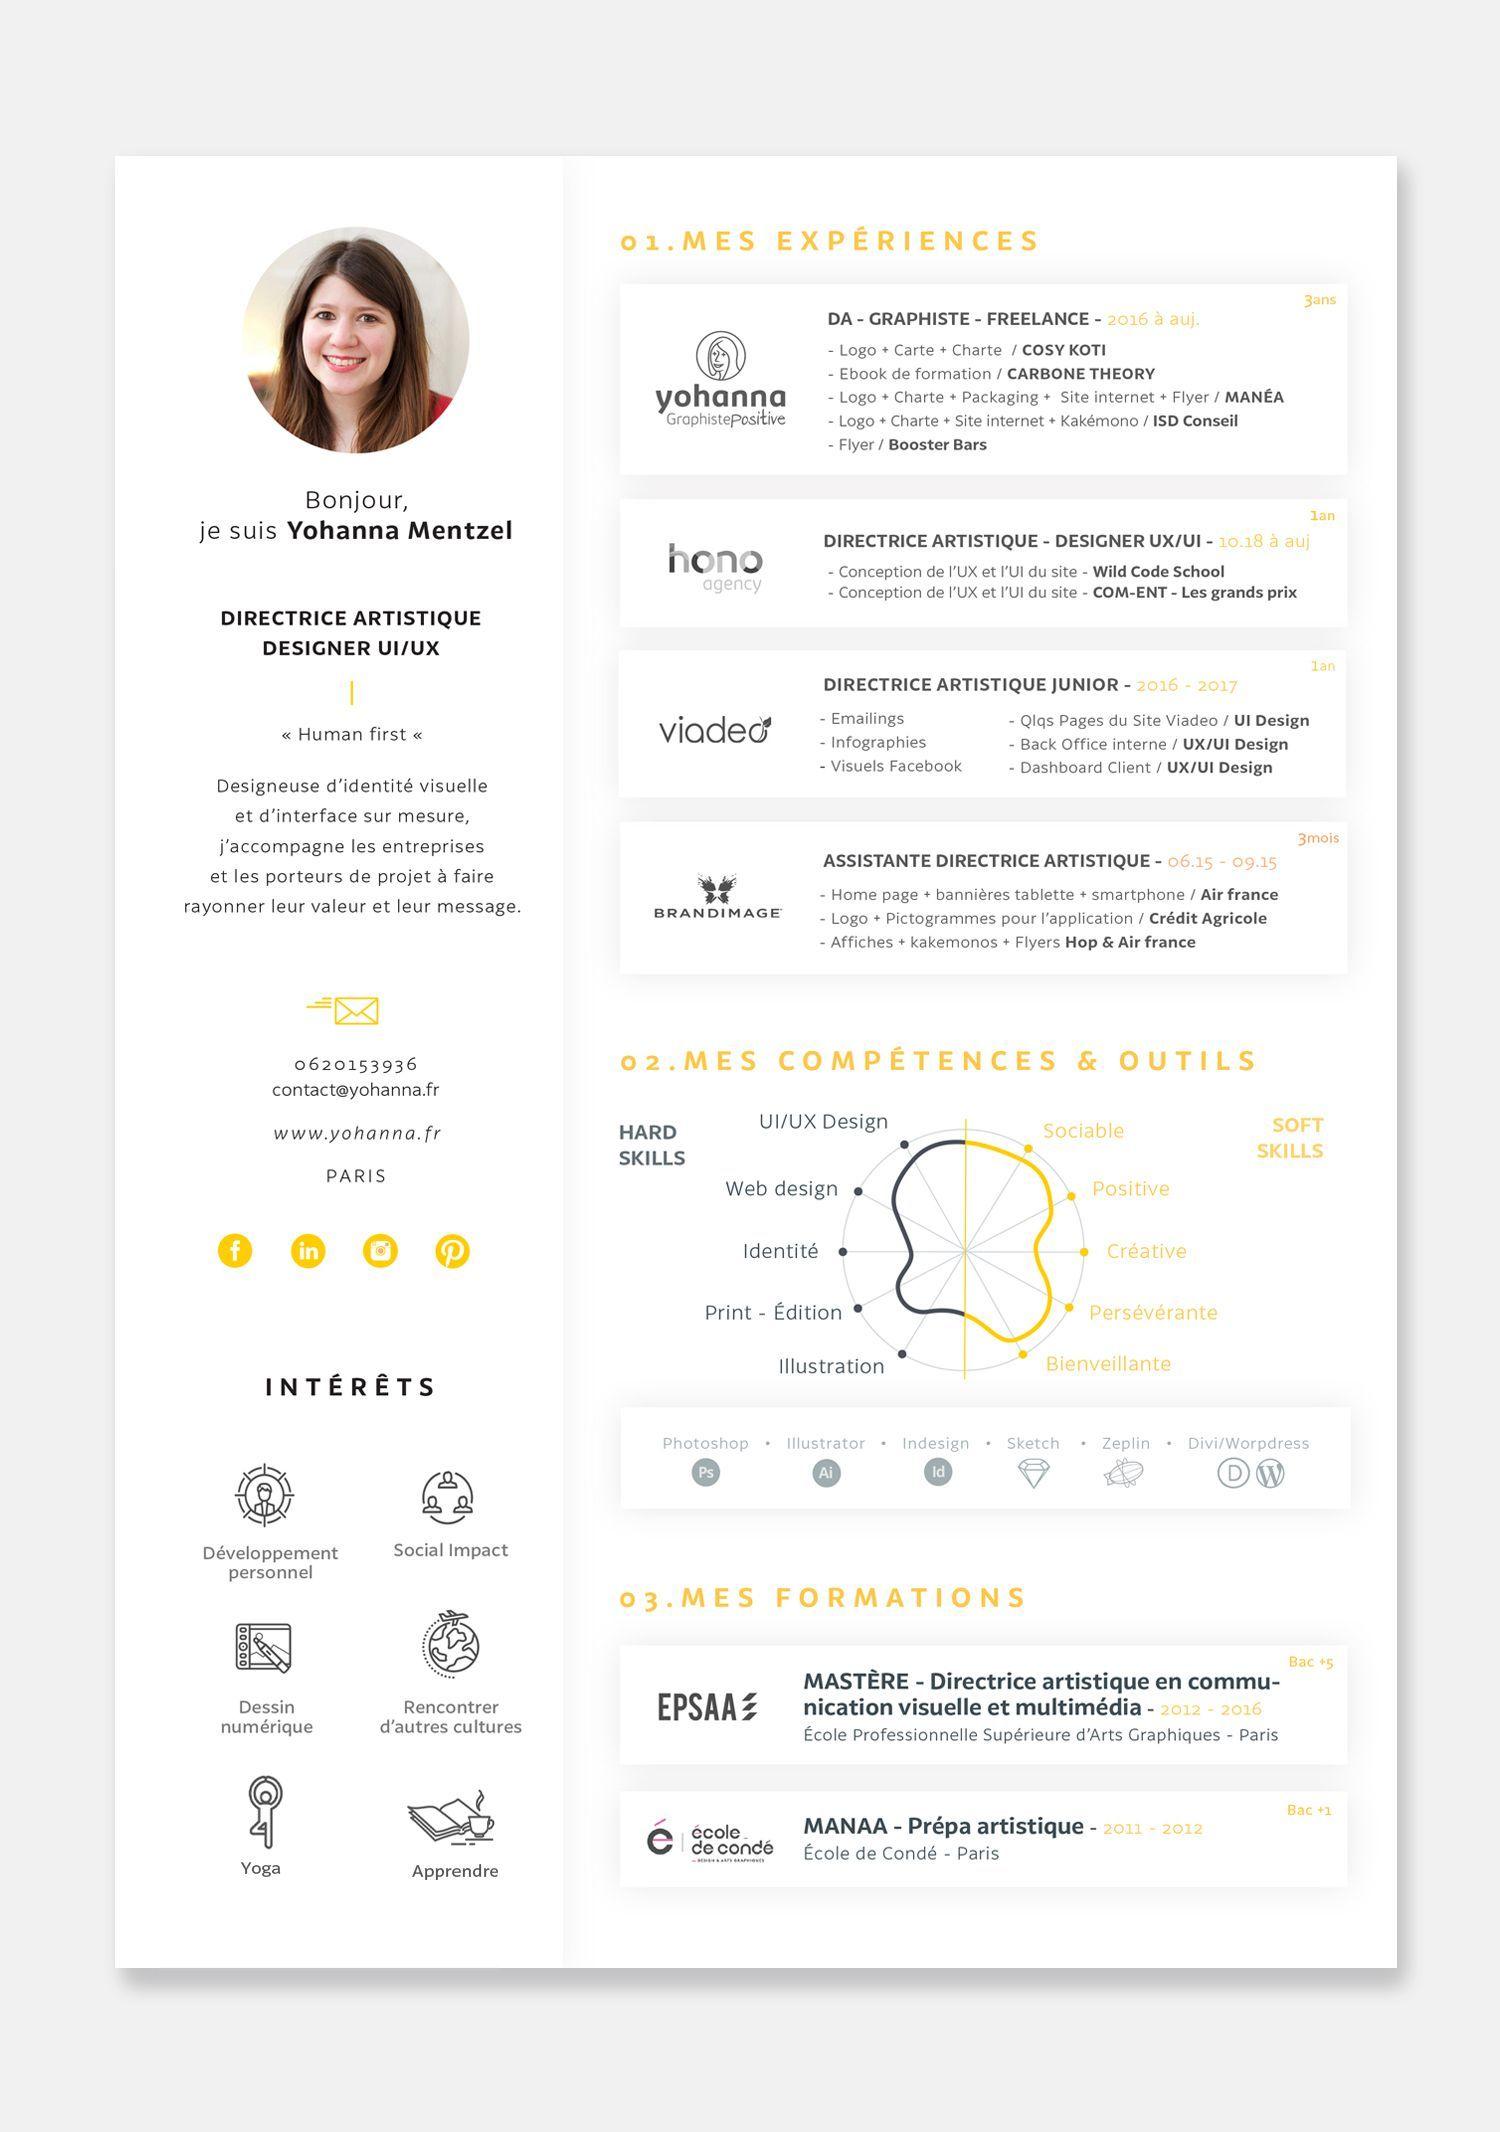 Cv Yohanna Mentzel 2018 Graphiste Positive Www Resume Design Creative Resume Design Resume Design Free